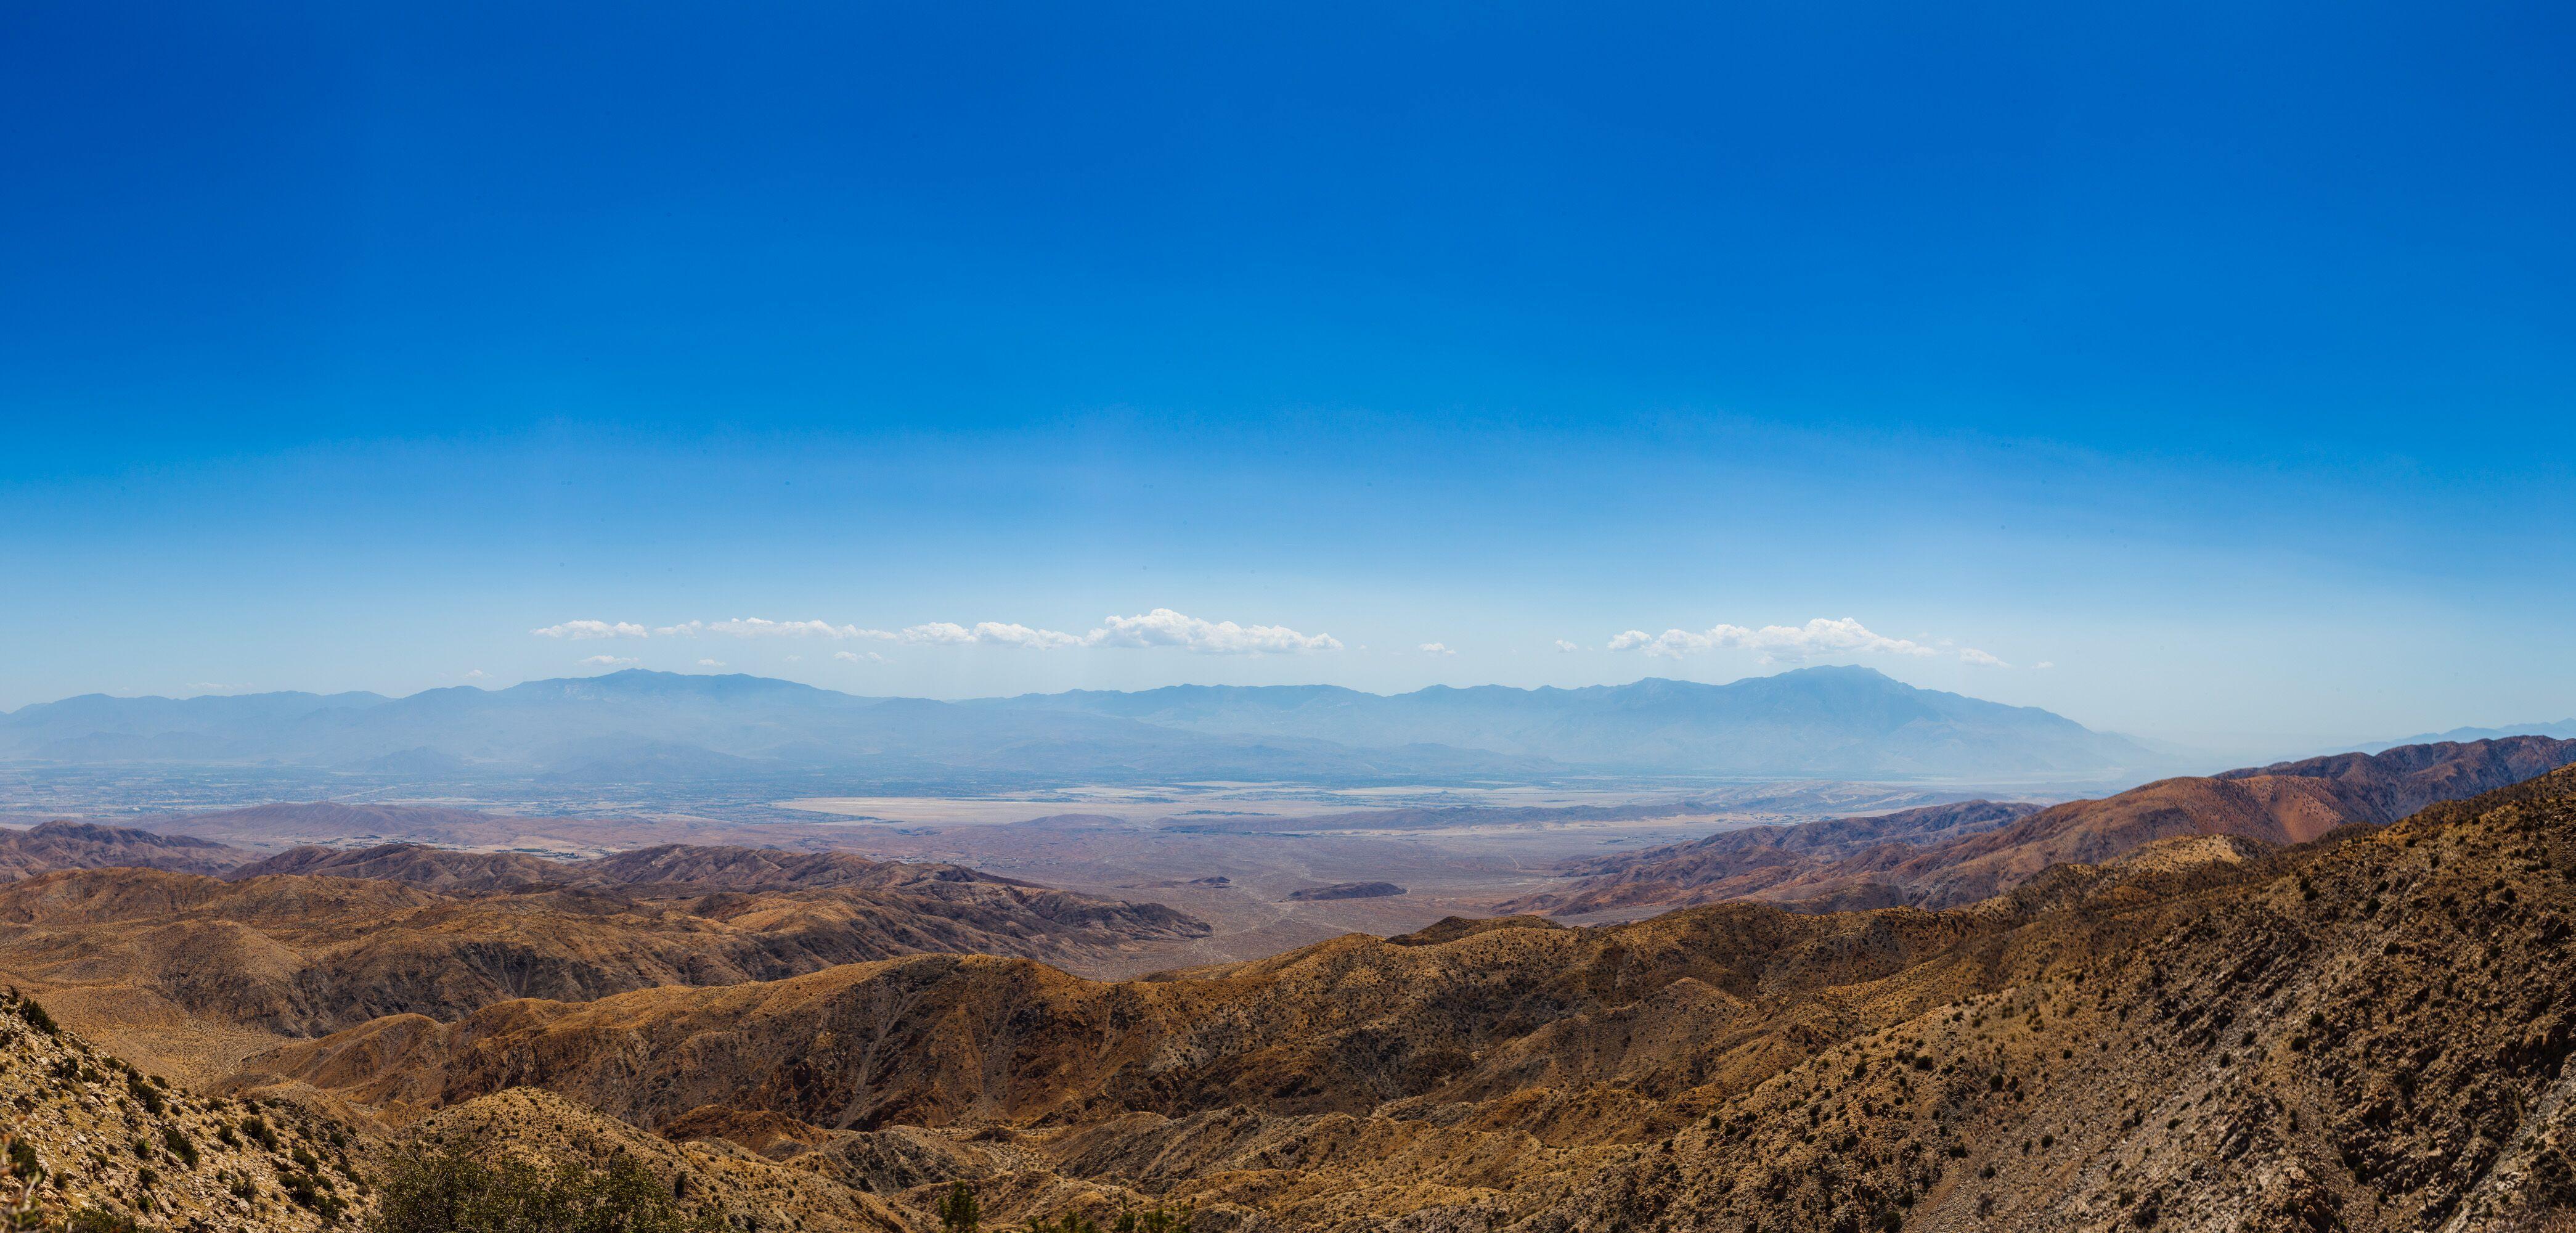 Key's View - Joshua Tree, CA